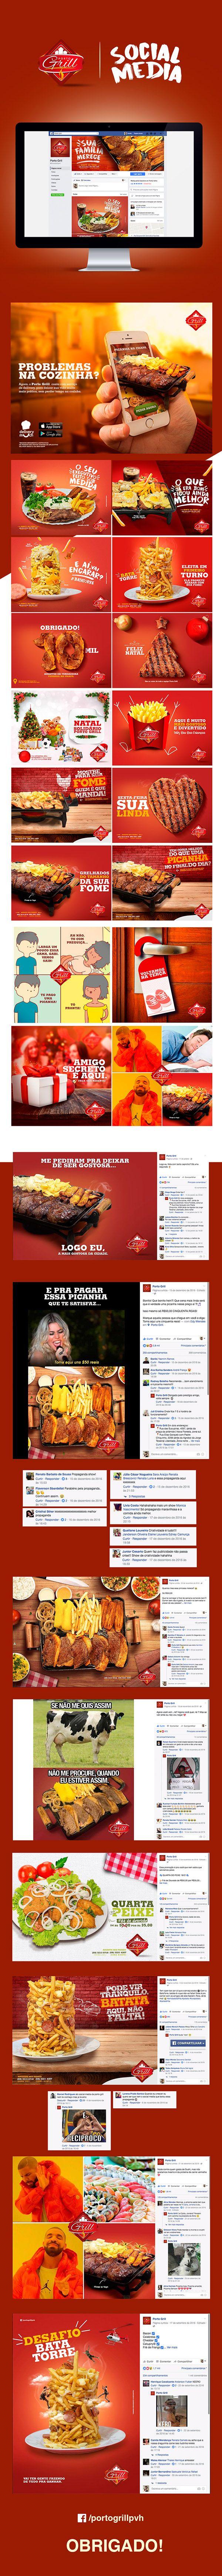 Porto Grill - Social Media